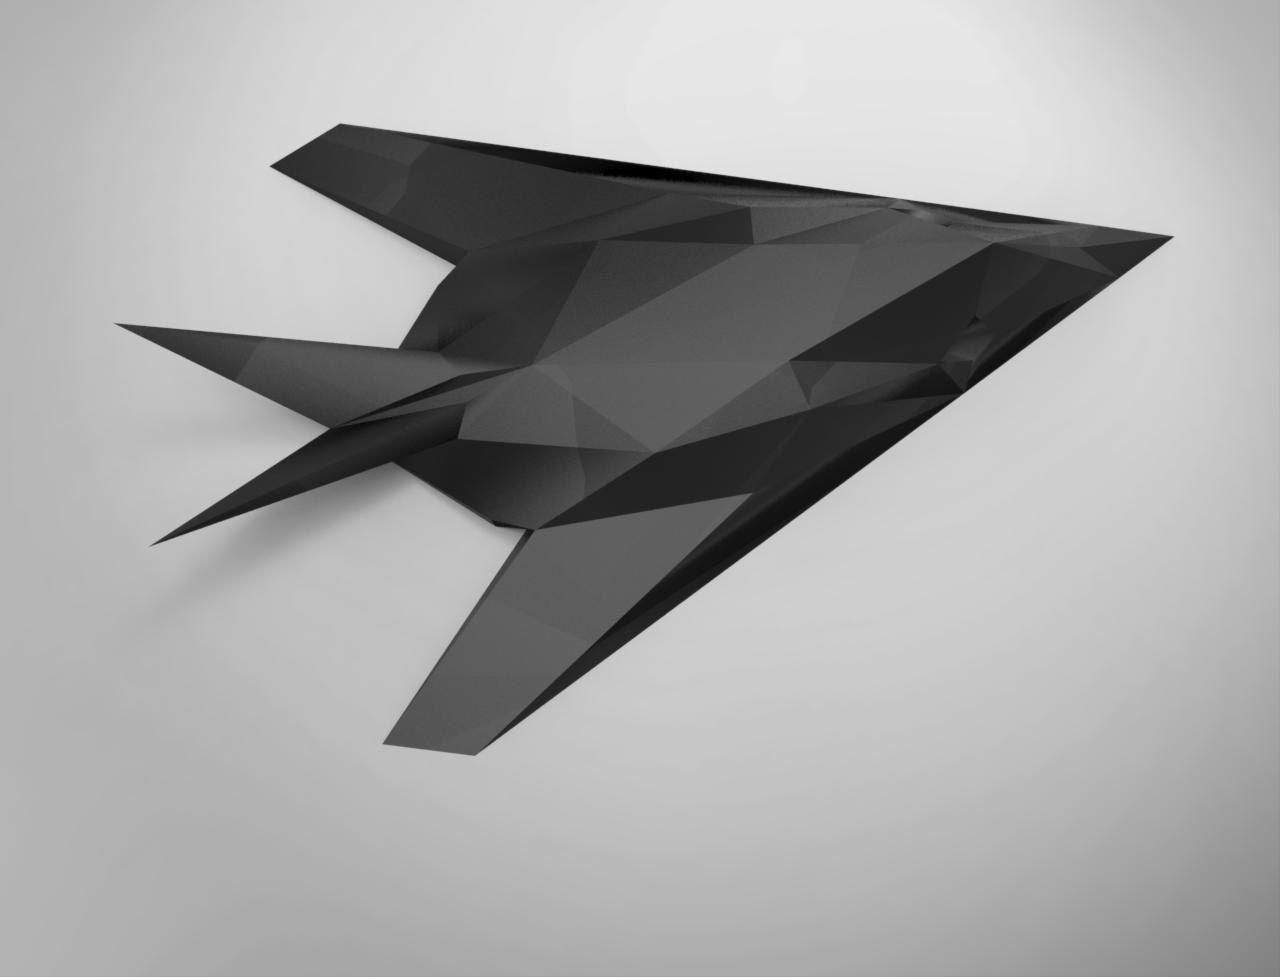 Plane Papercraft Printable Paper Craft Model F 117 Nighthawk Fighter Jet Diy Pdf